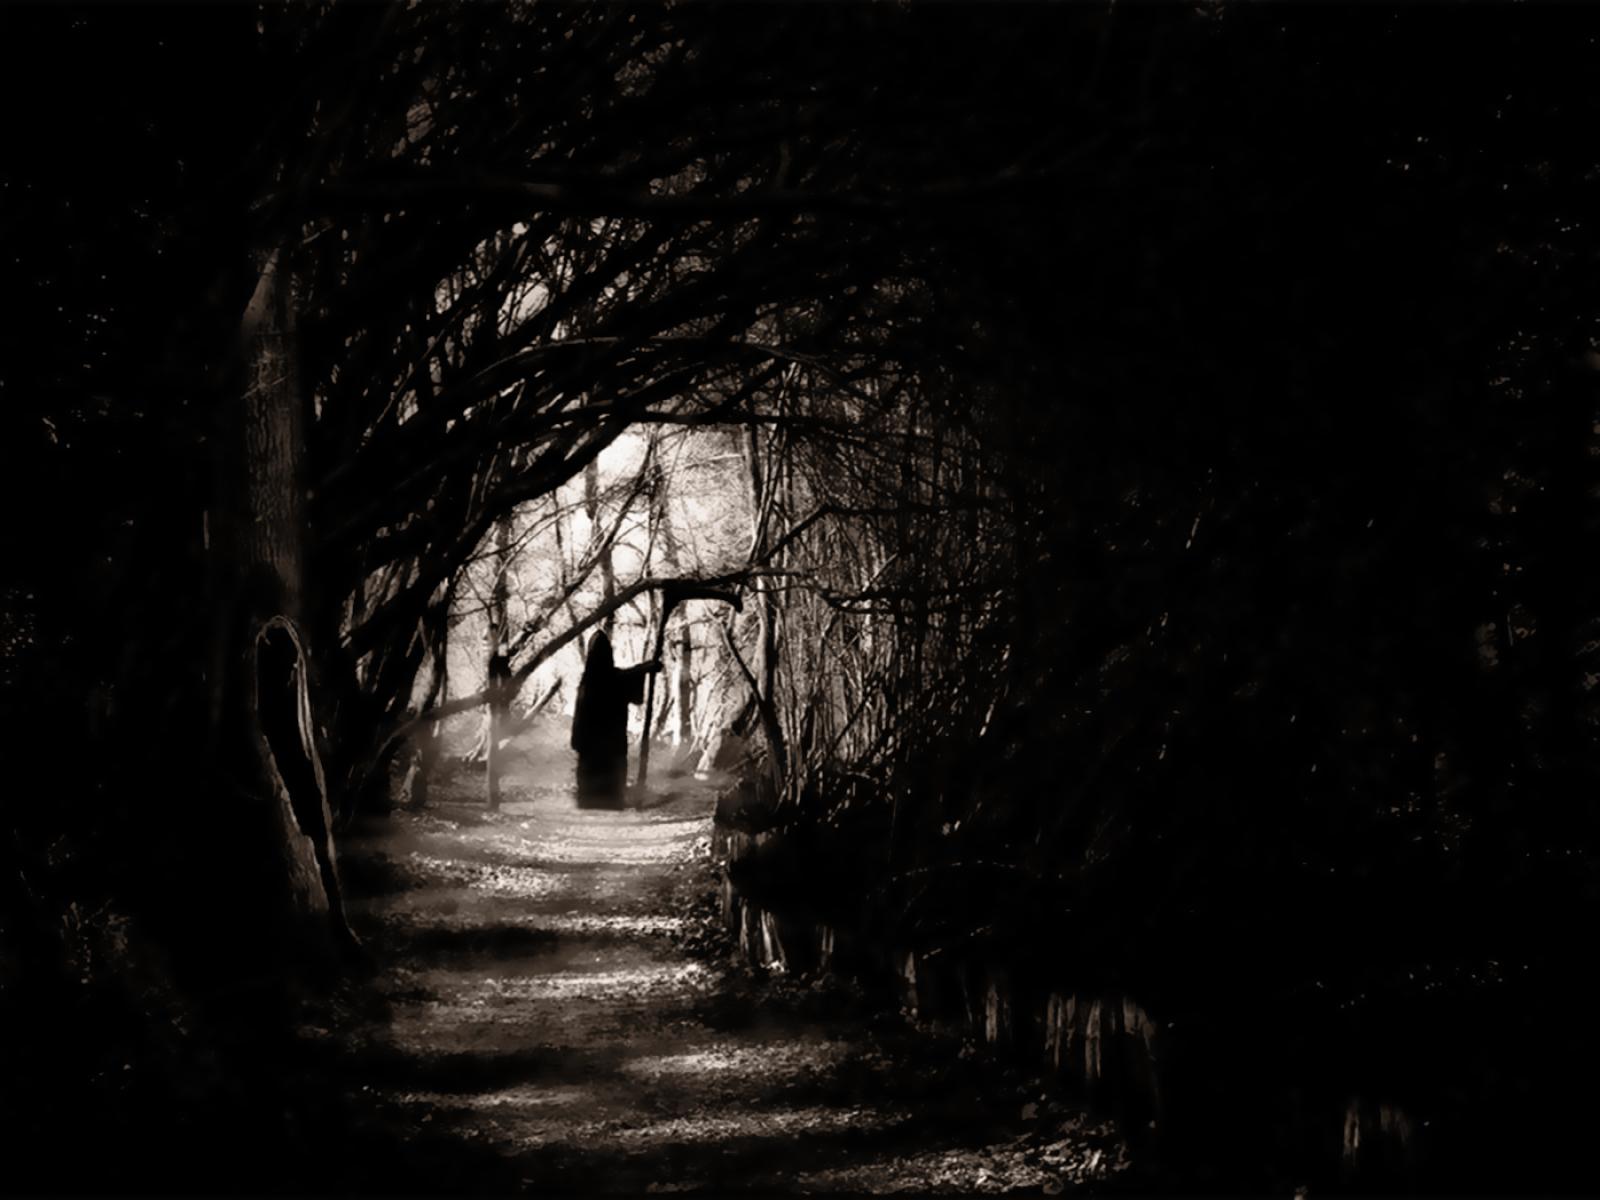 Dark Grim Reaper horror skeletons skull creepy l wallpaper 1600x1200 1600x1200